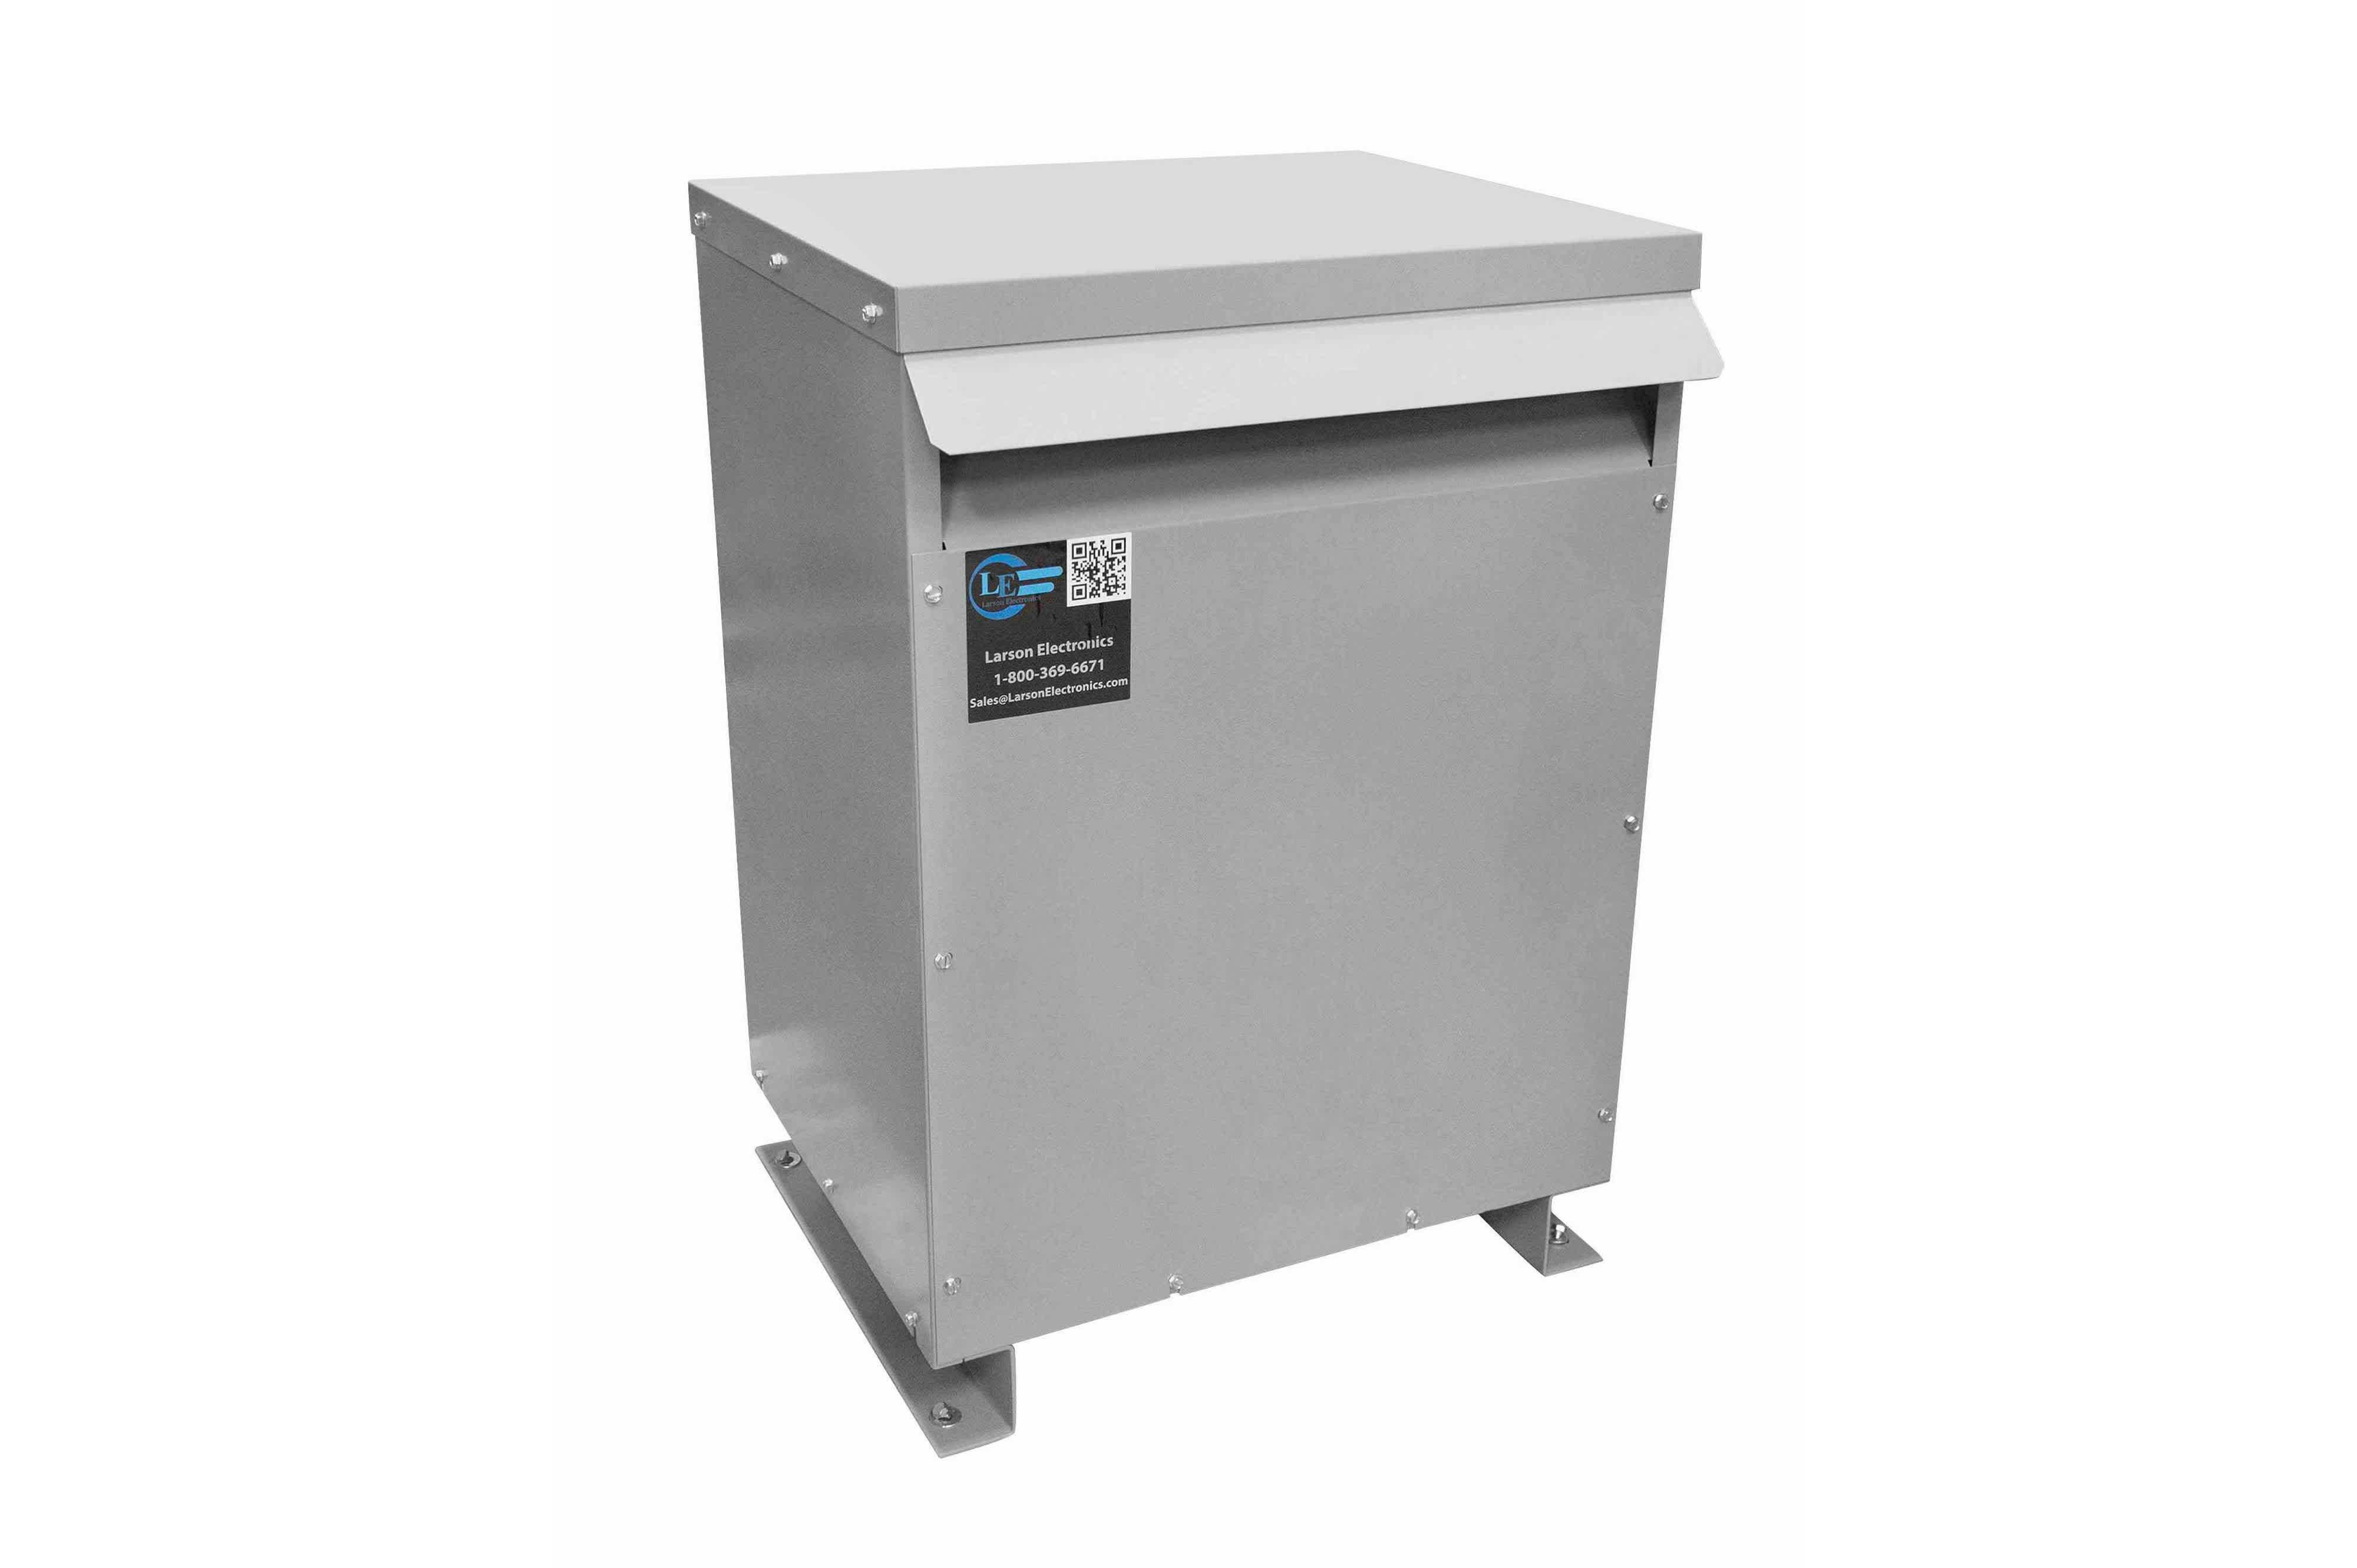 38 kVA 3PH Isolation Transformer, 415V Wye Primary, 208Y/120 Wye-N Secondary, N3R, Ventilated, 60 Hz